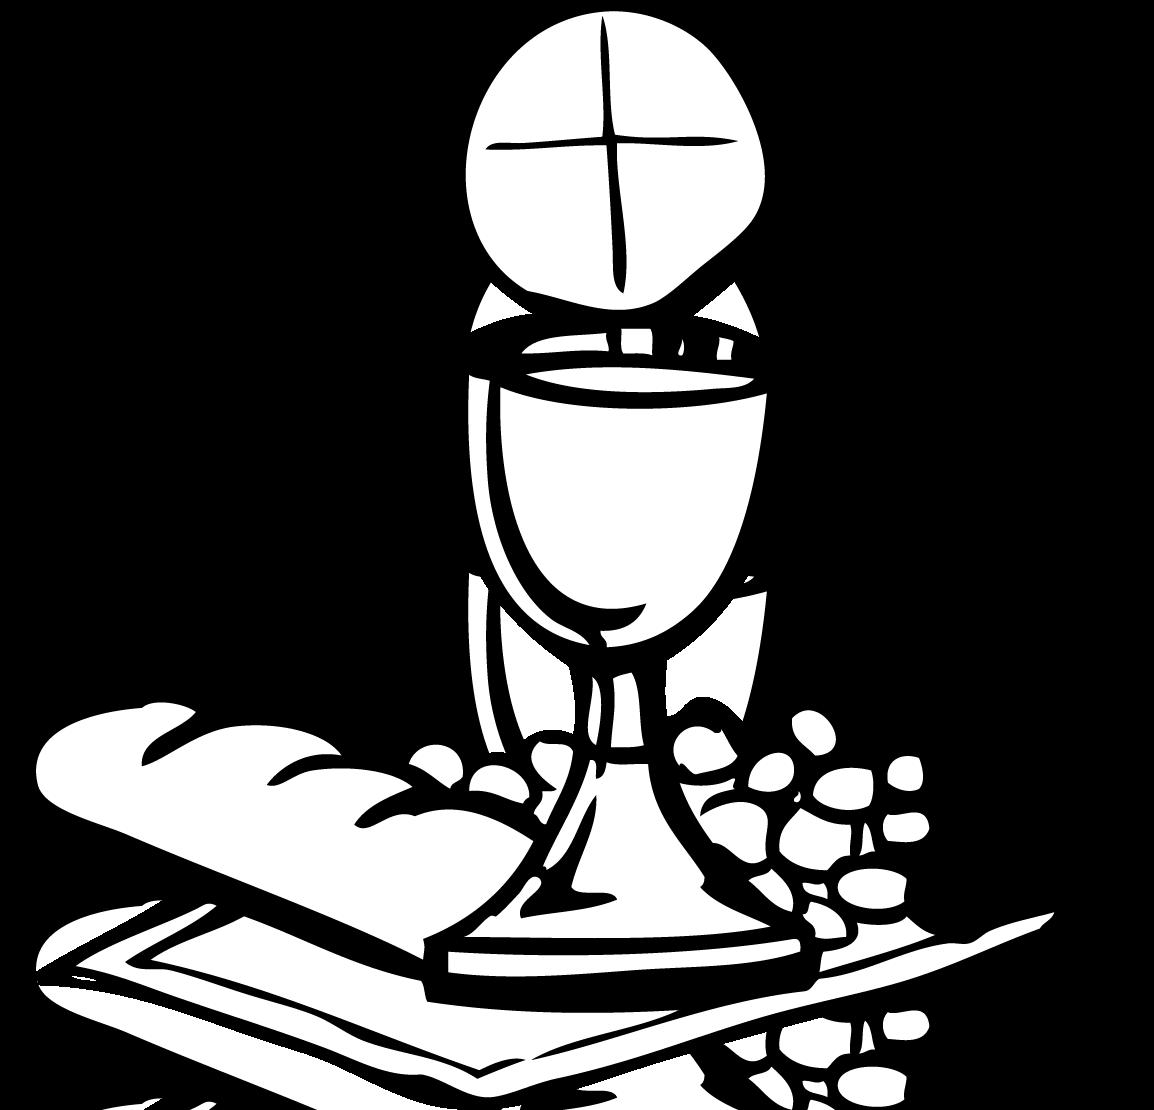 1154x1110 Christian Clipart Communion